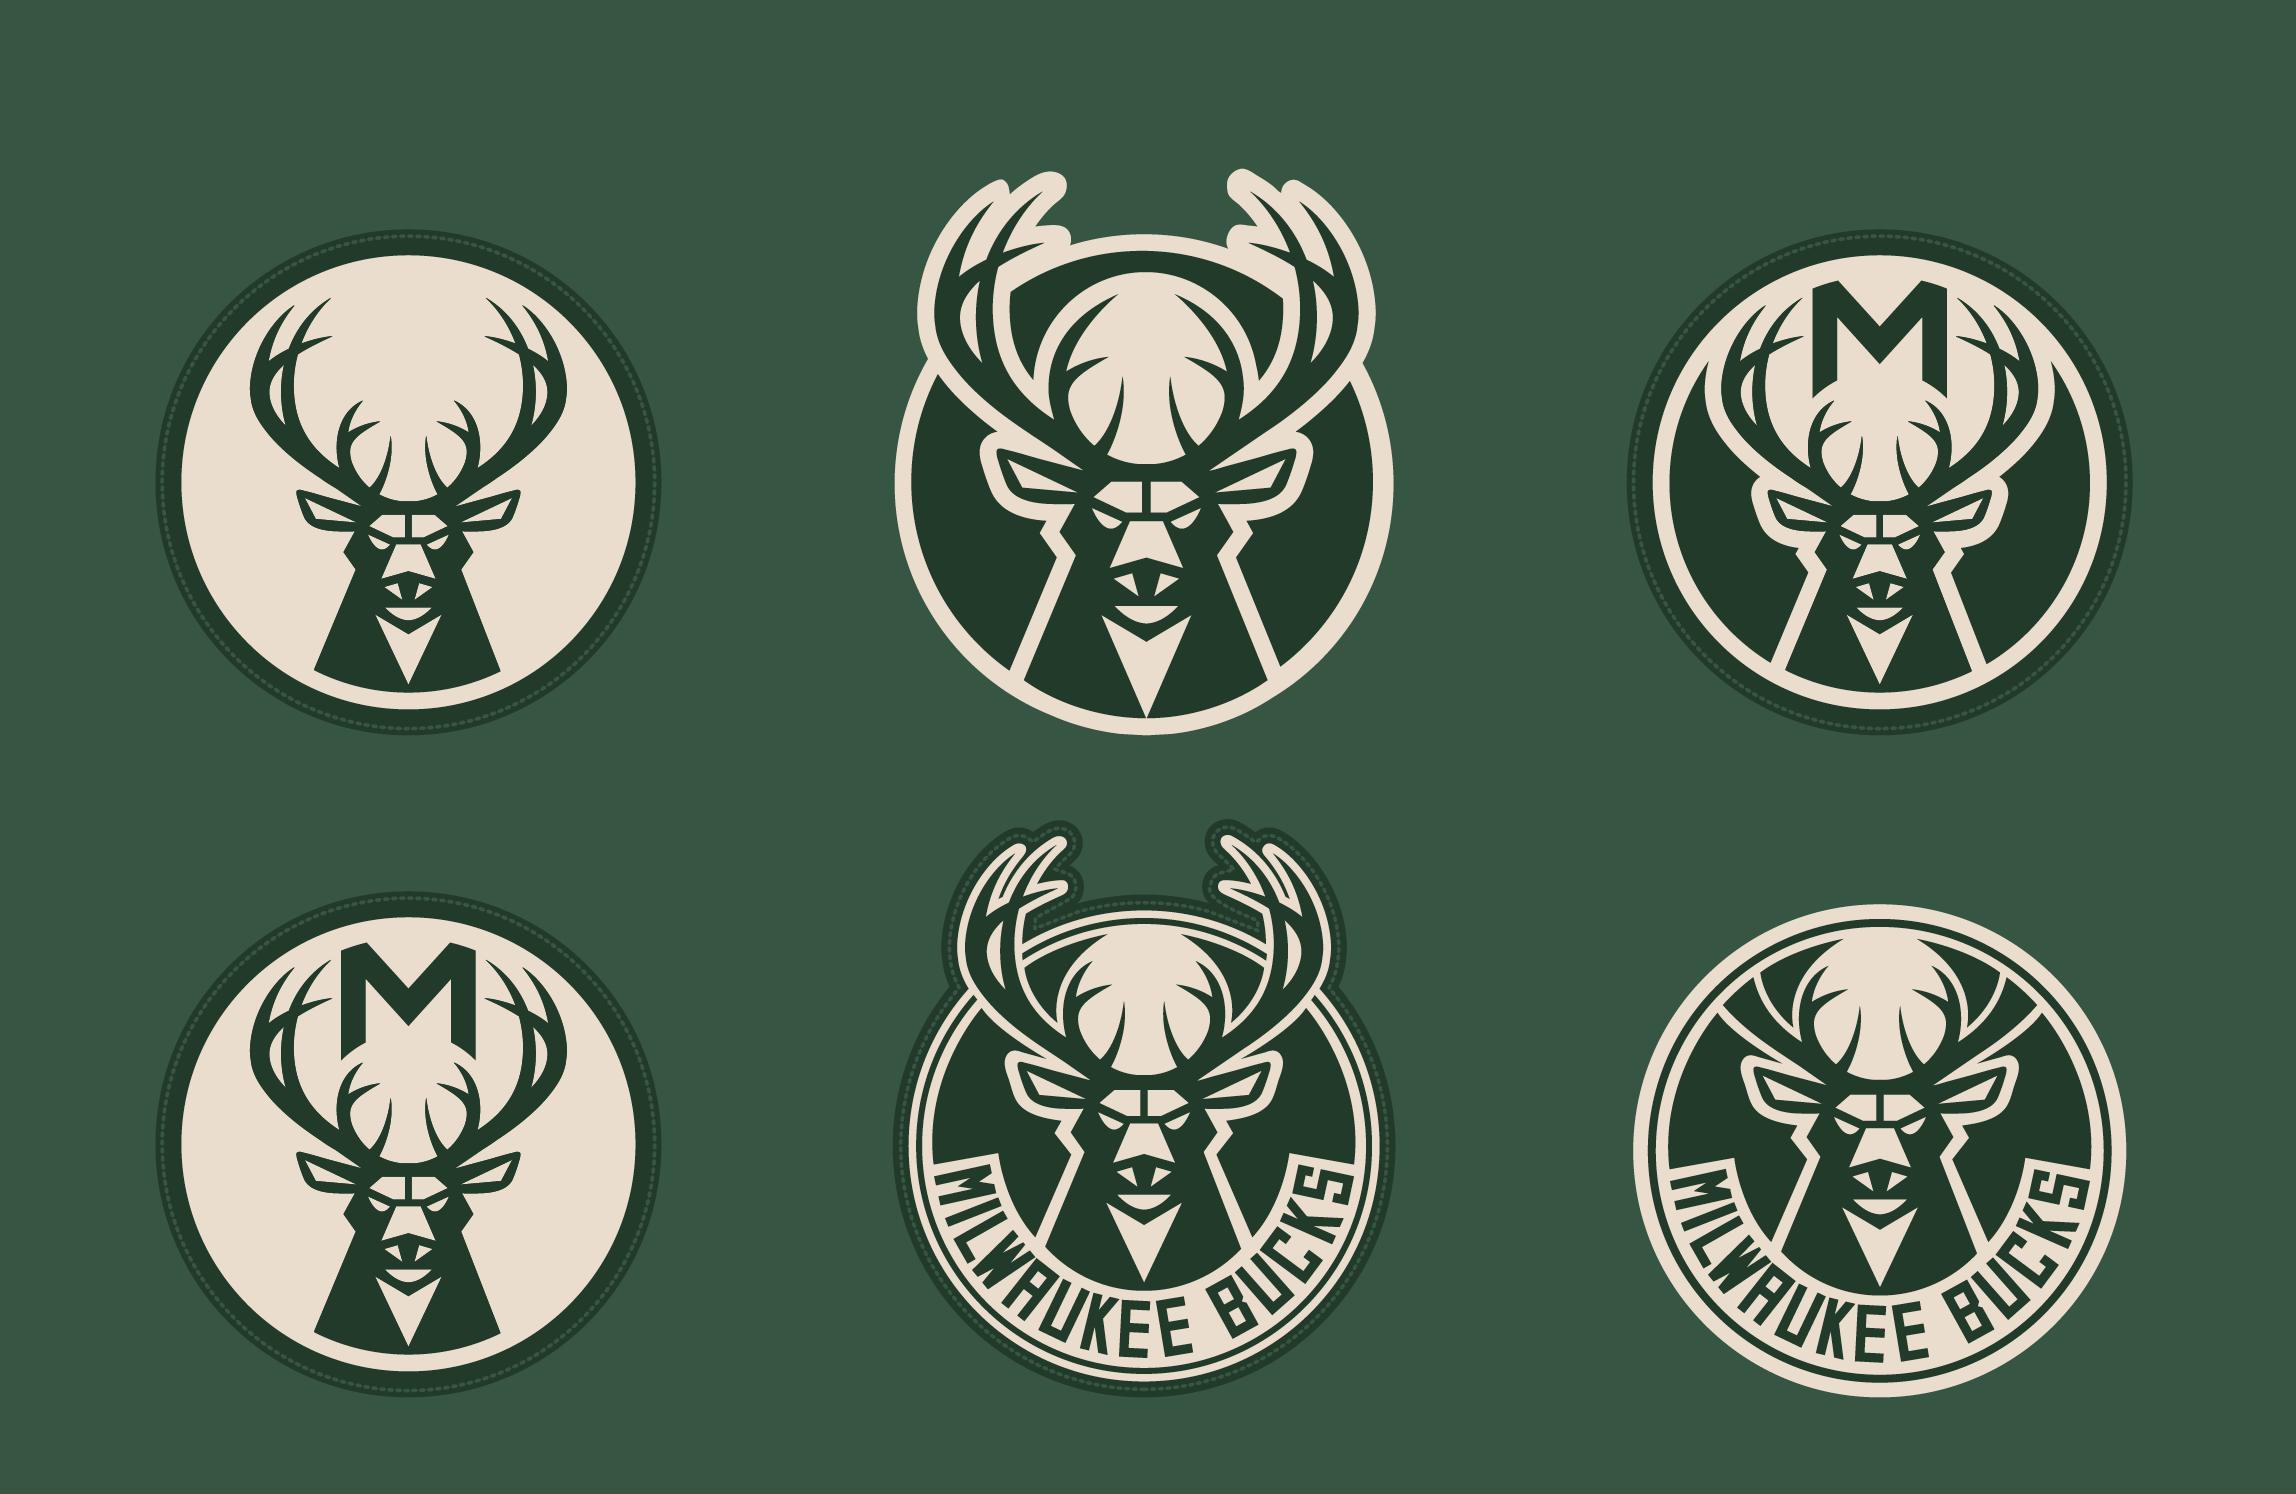 Milwaukee Bucks Unveil New Logos Colors 5f93739cb